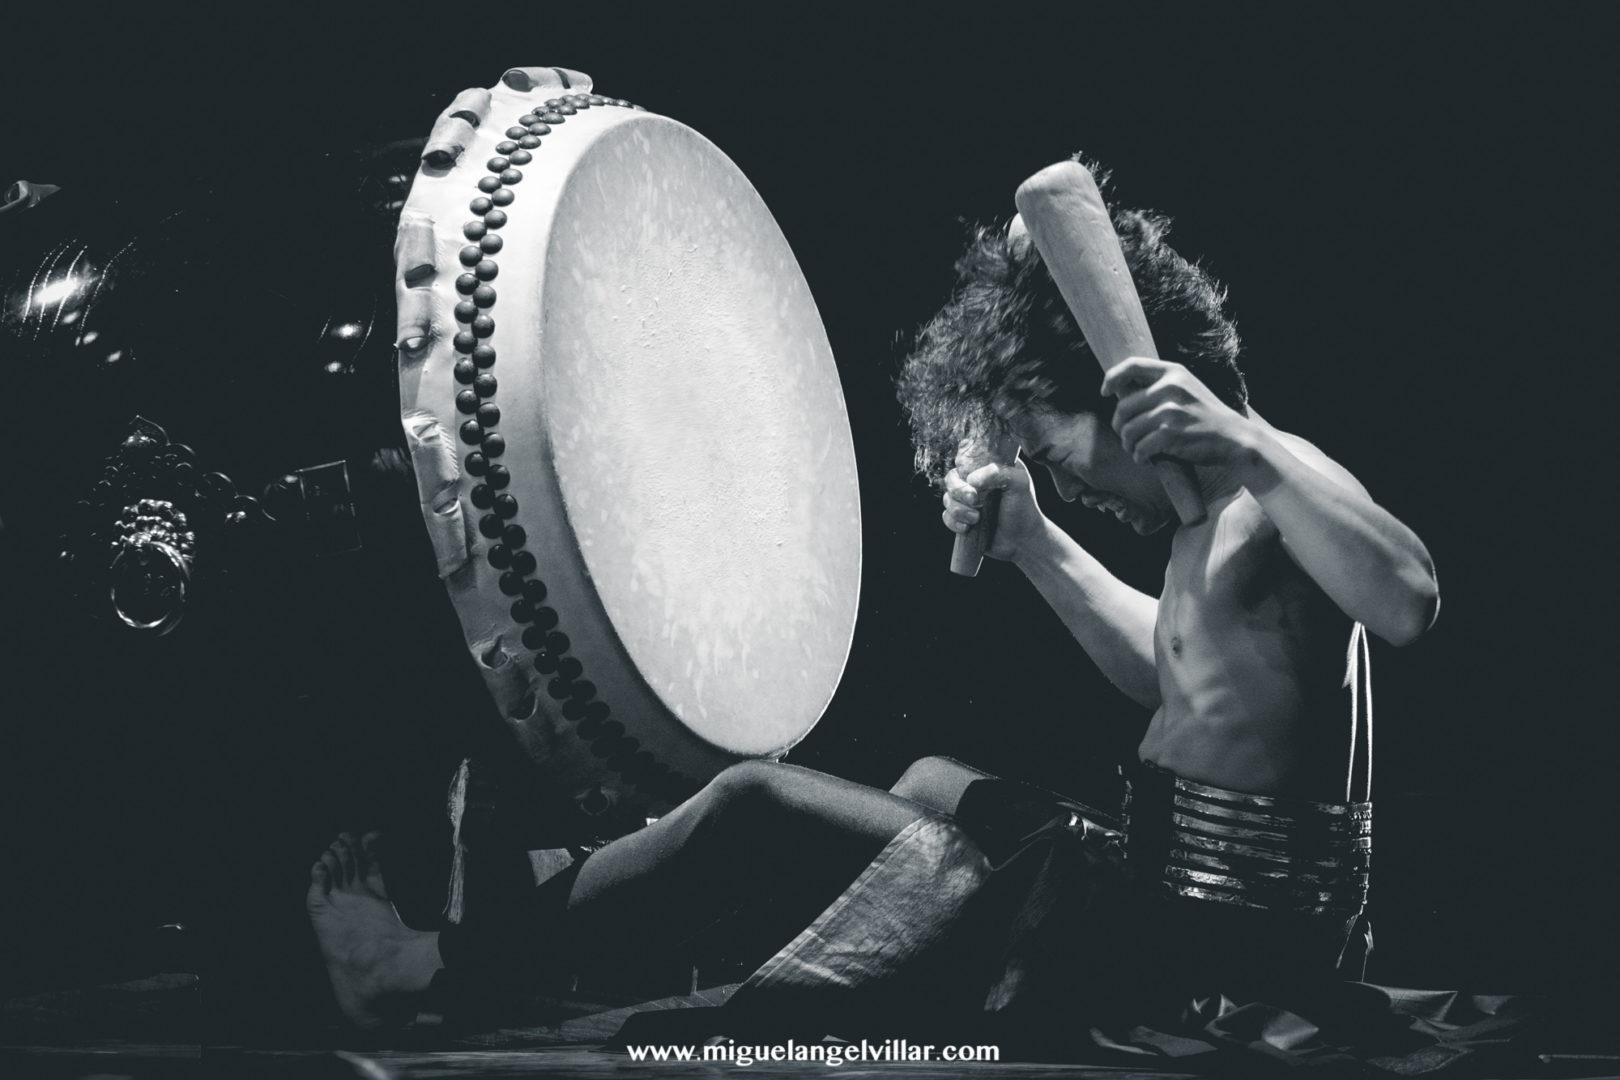 Tao, The Samurai of the Drum - Torrevieja 2017